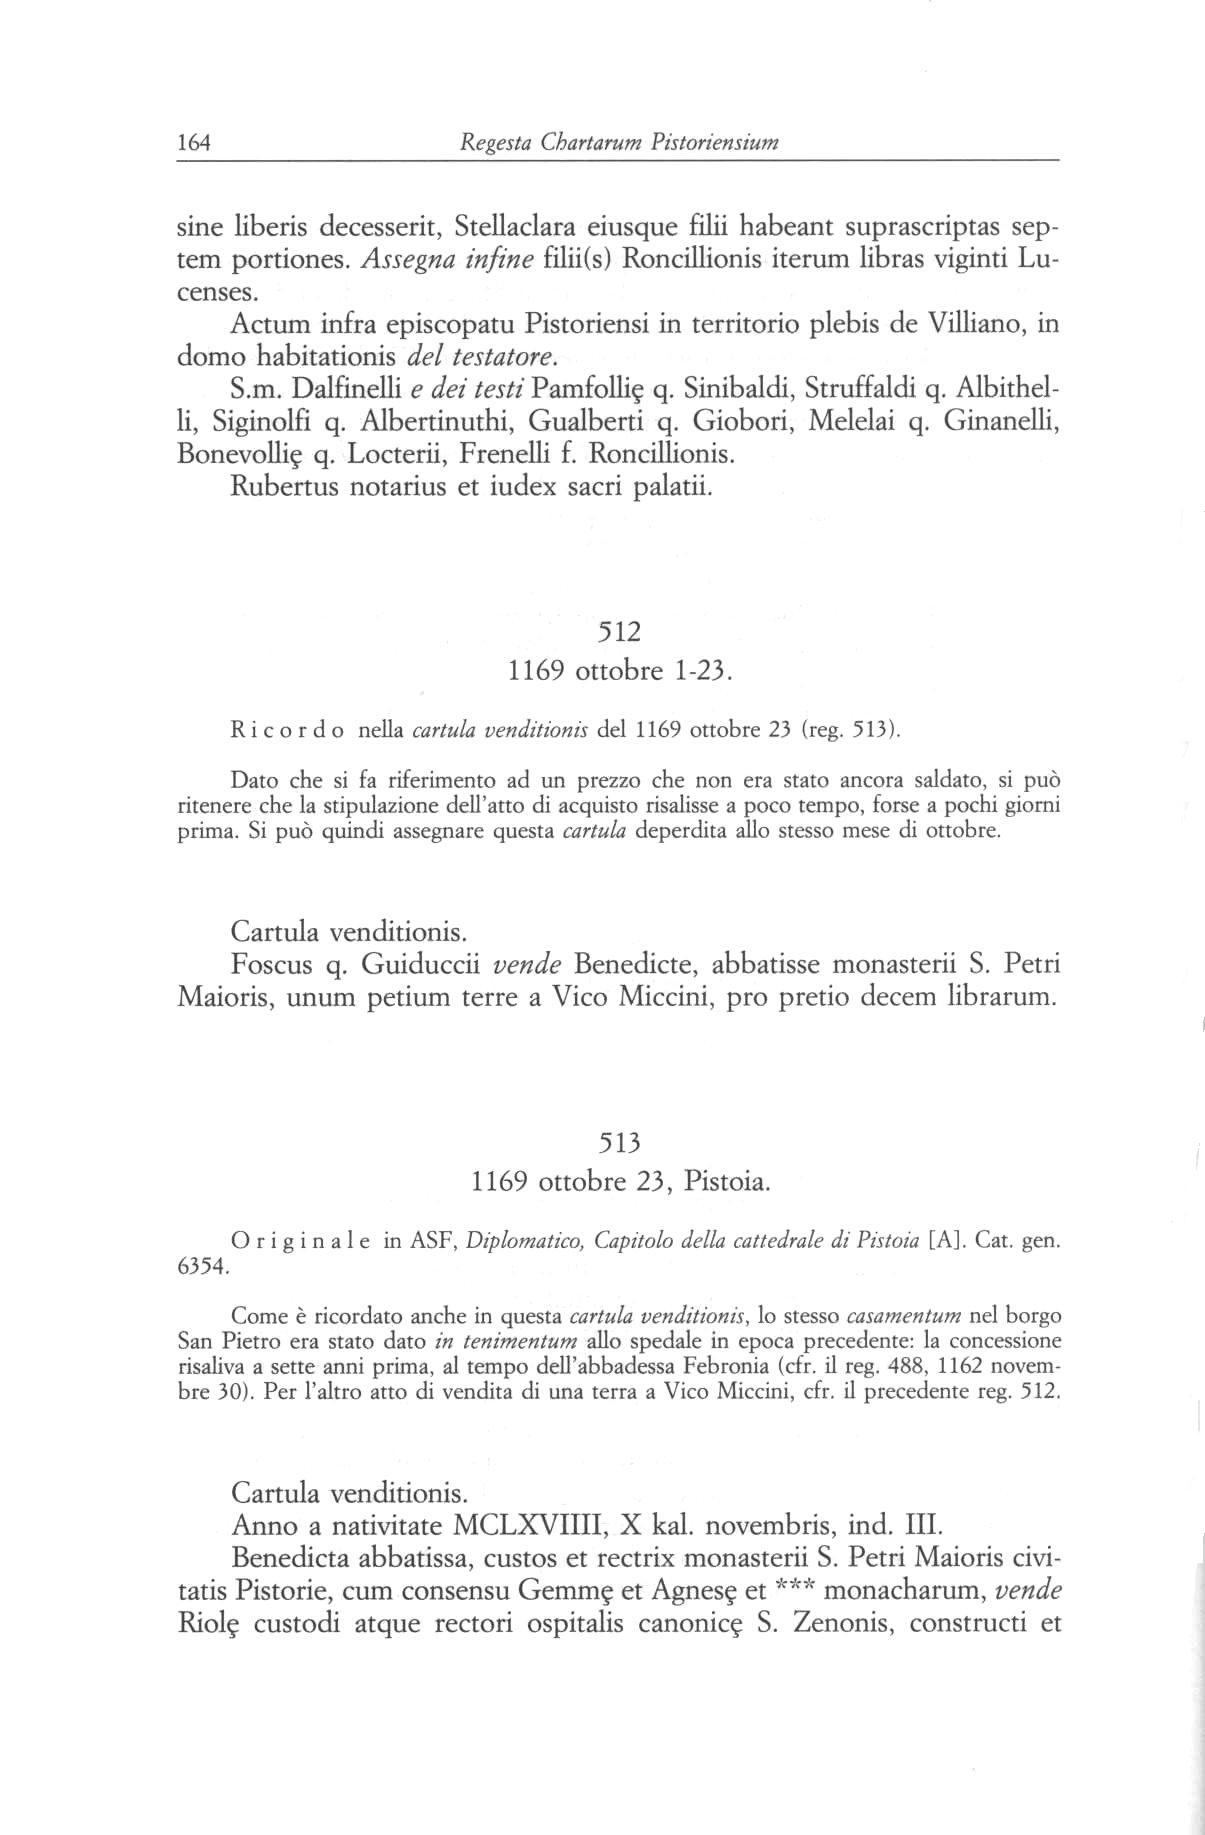 Canonica S. Zenone XII 0164.jpg